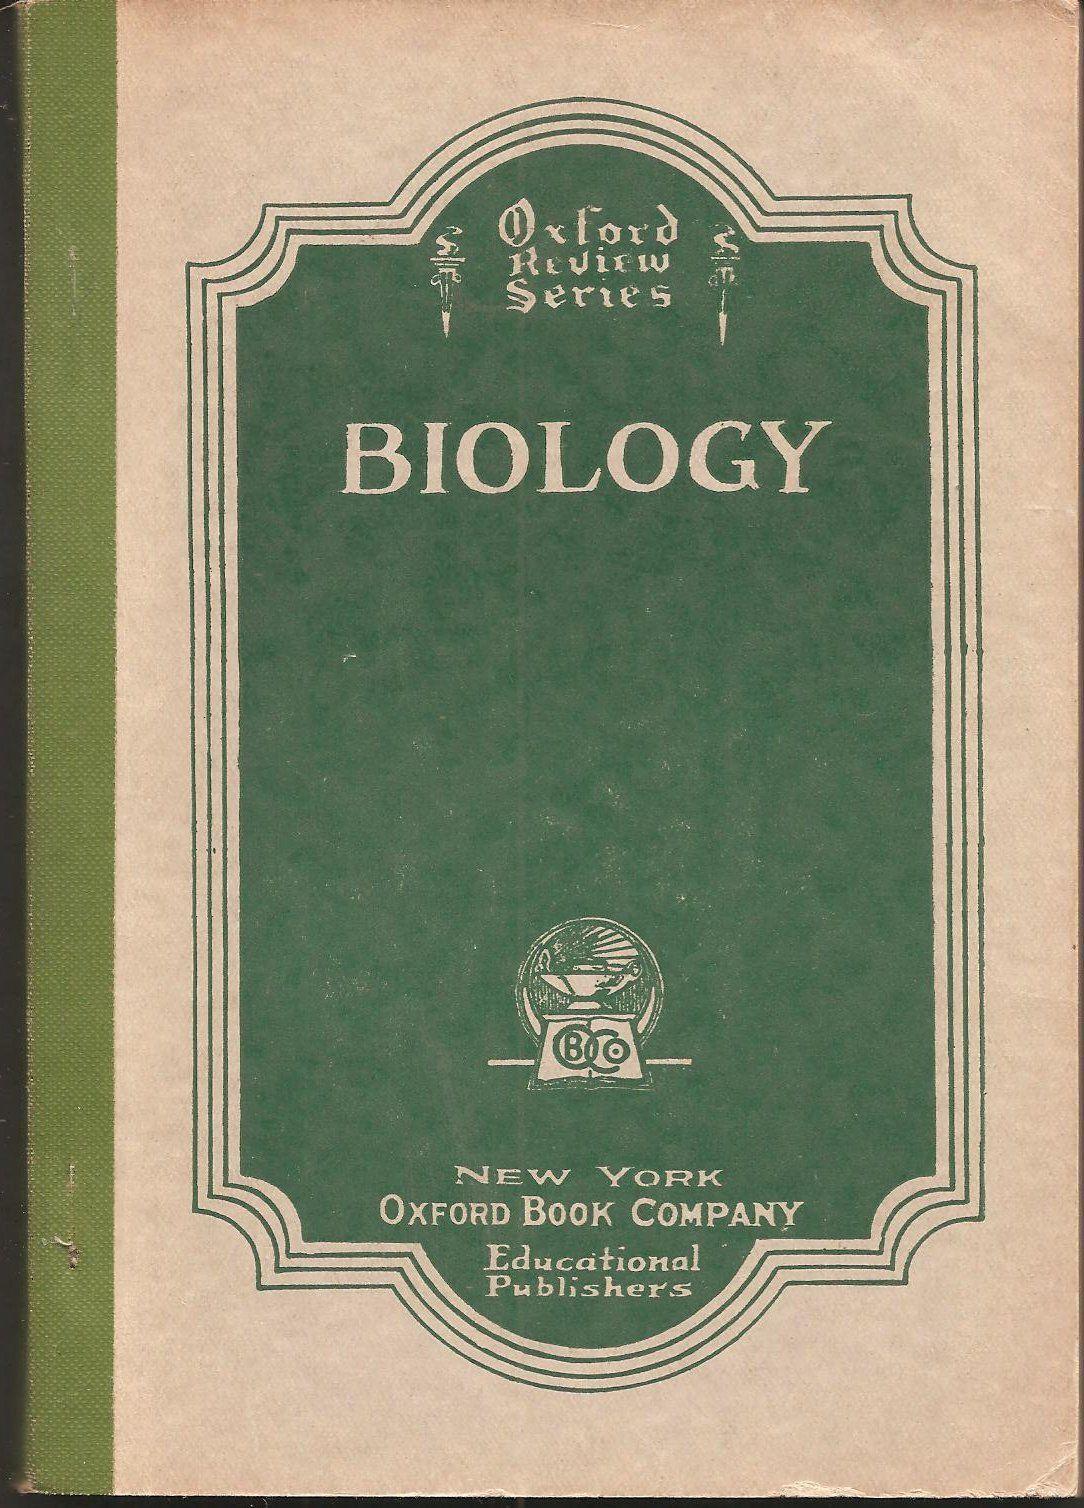 Series - Oxford University Press